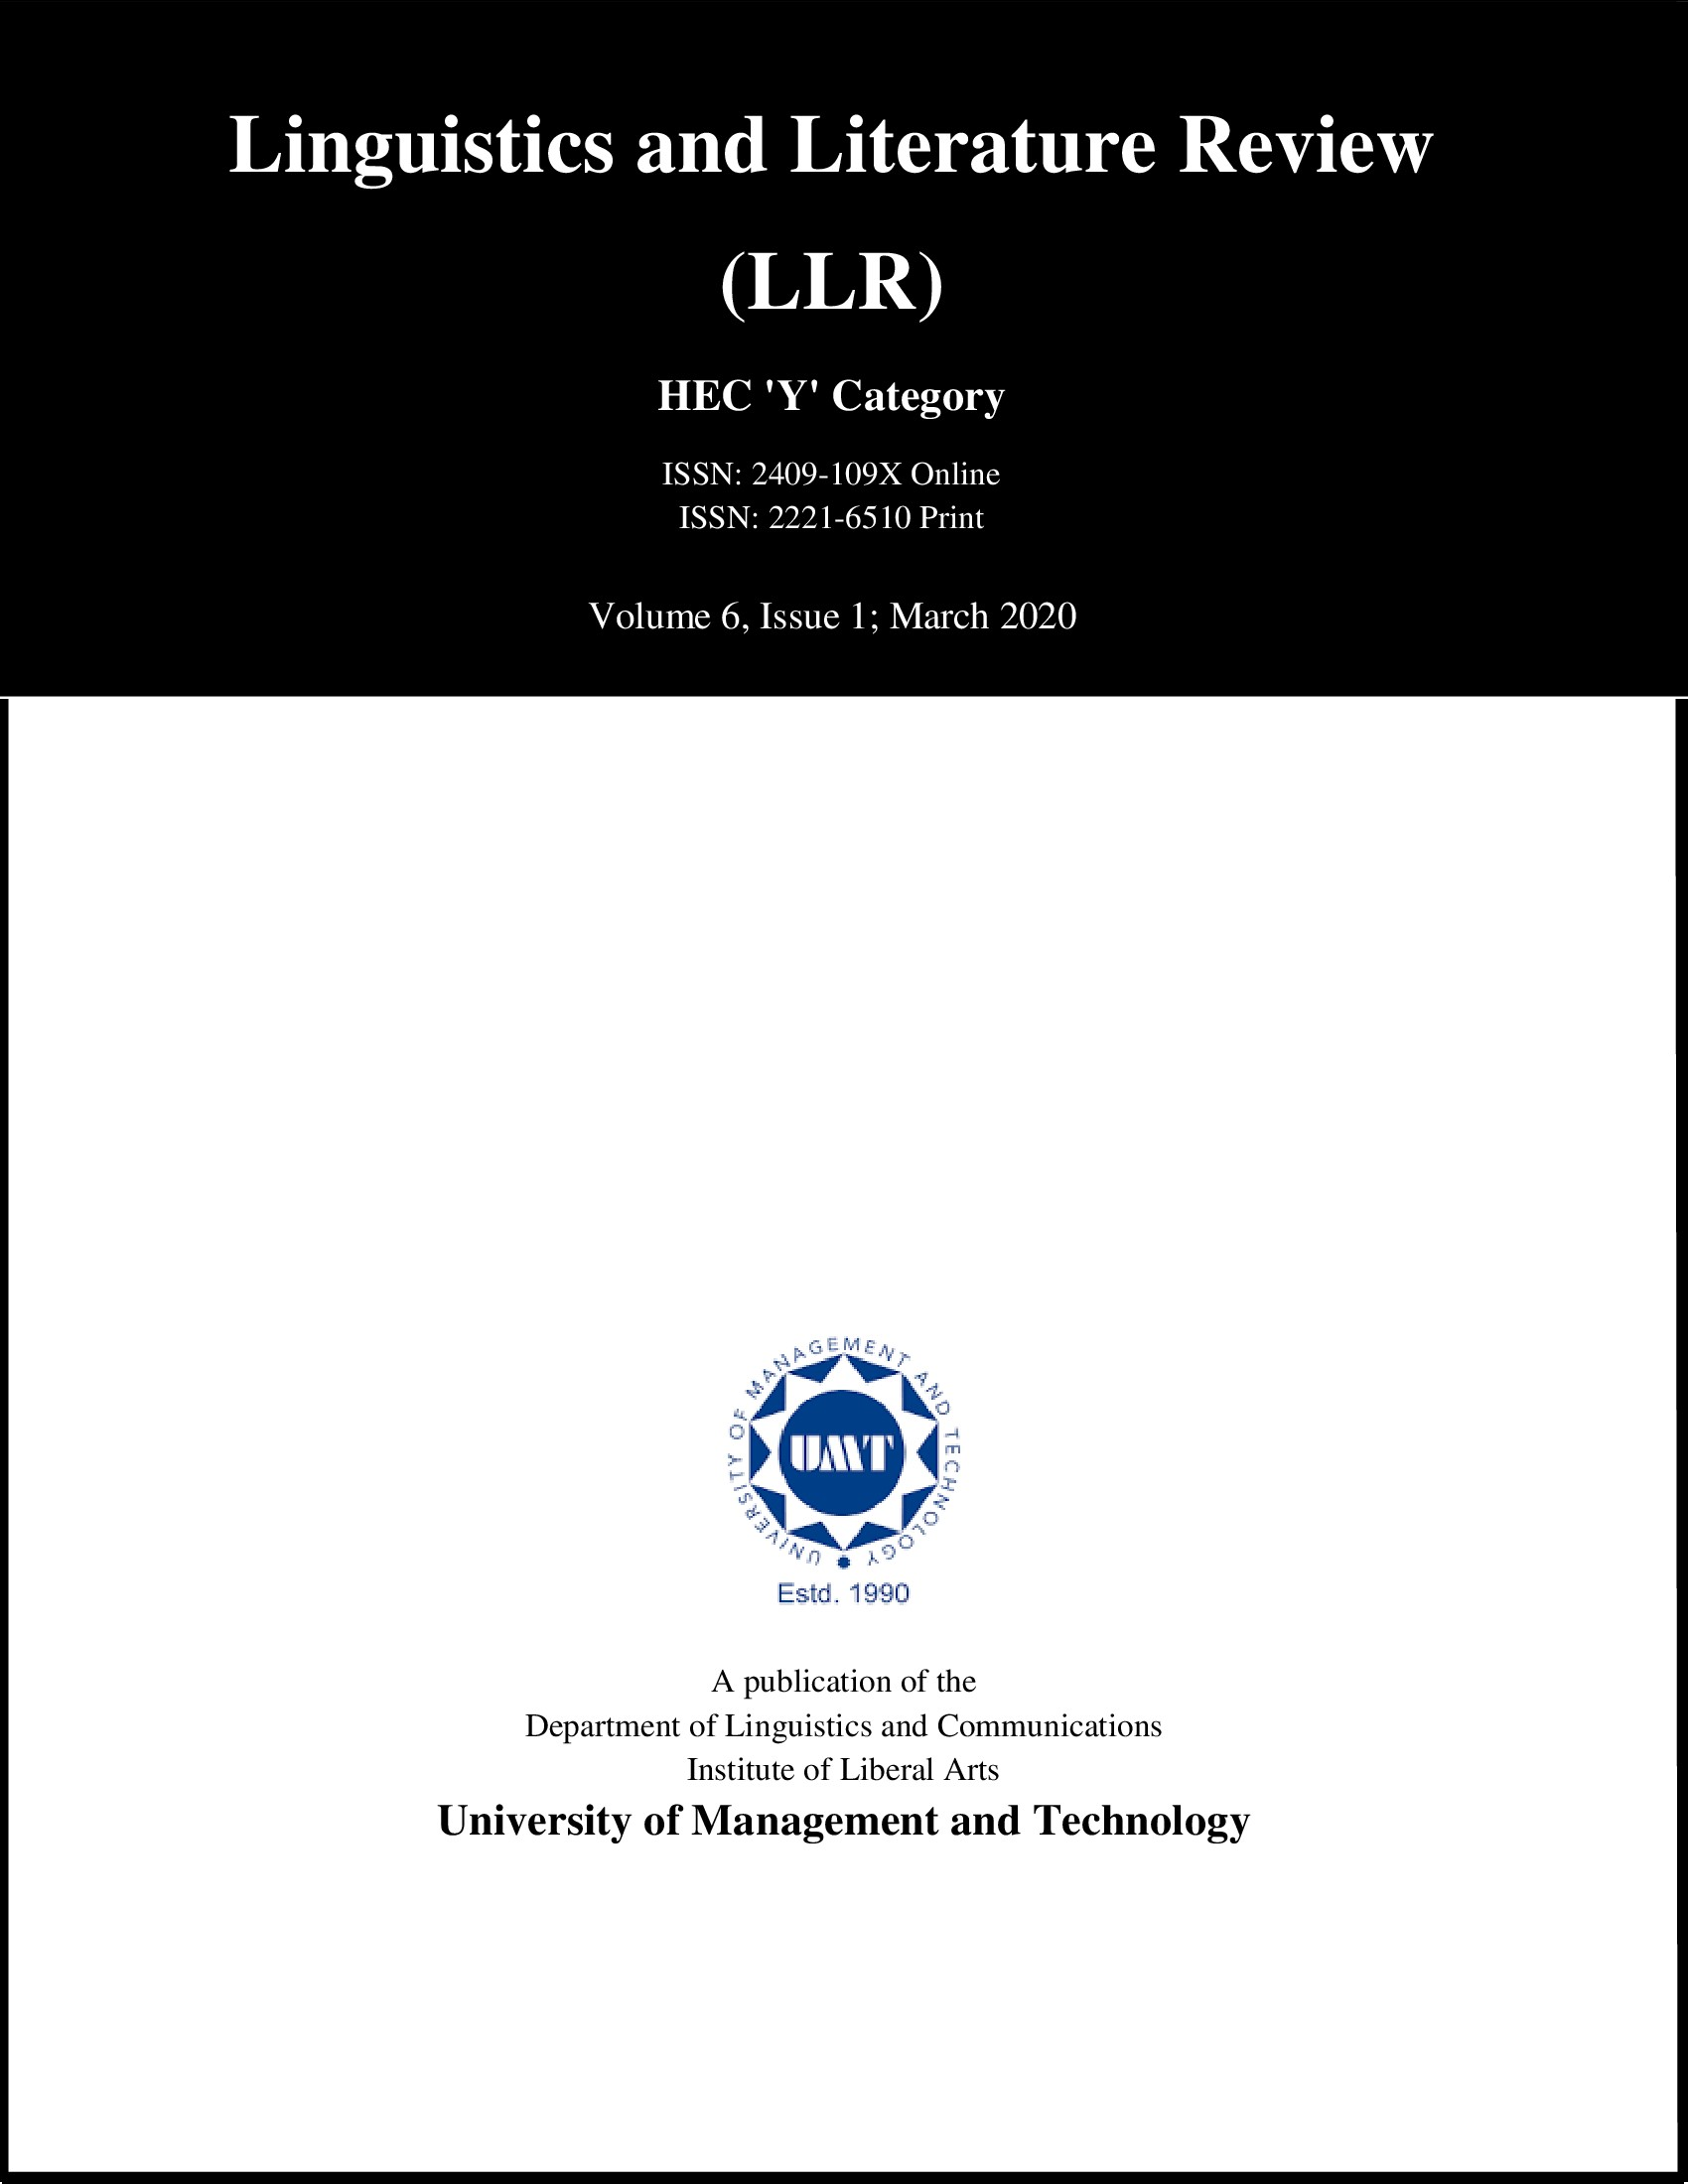 Linguistics and Literature Review-Asos İndeks